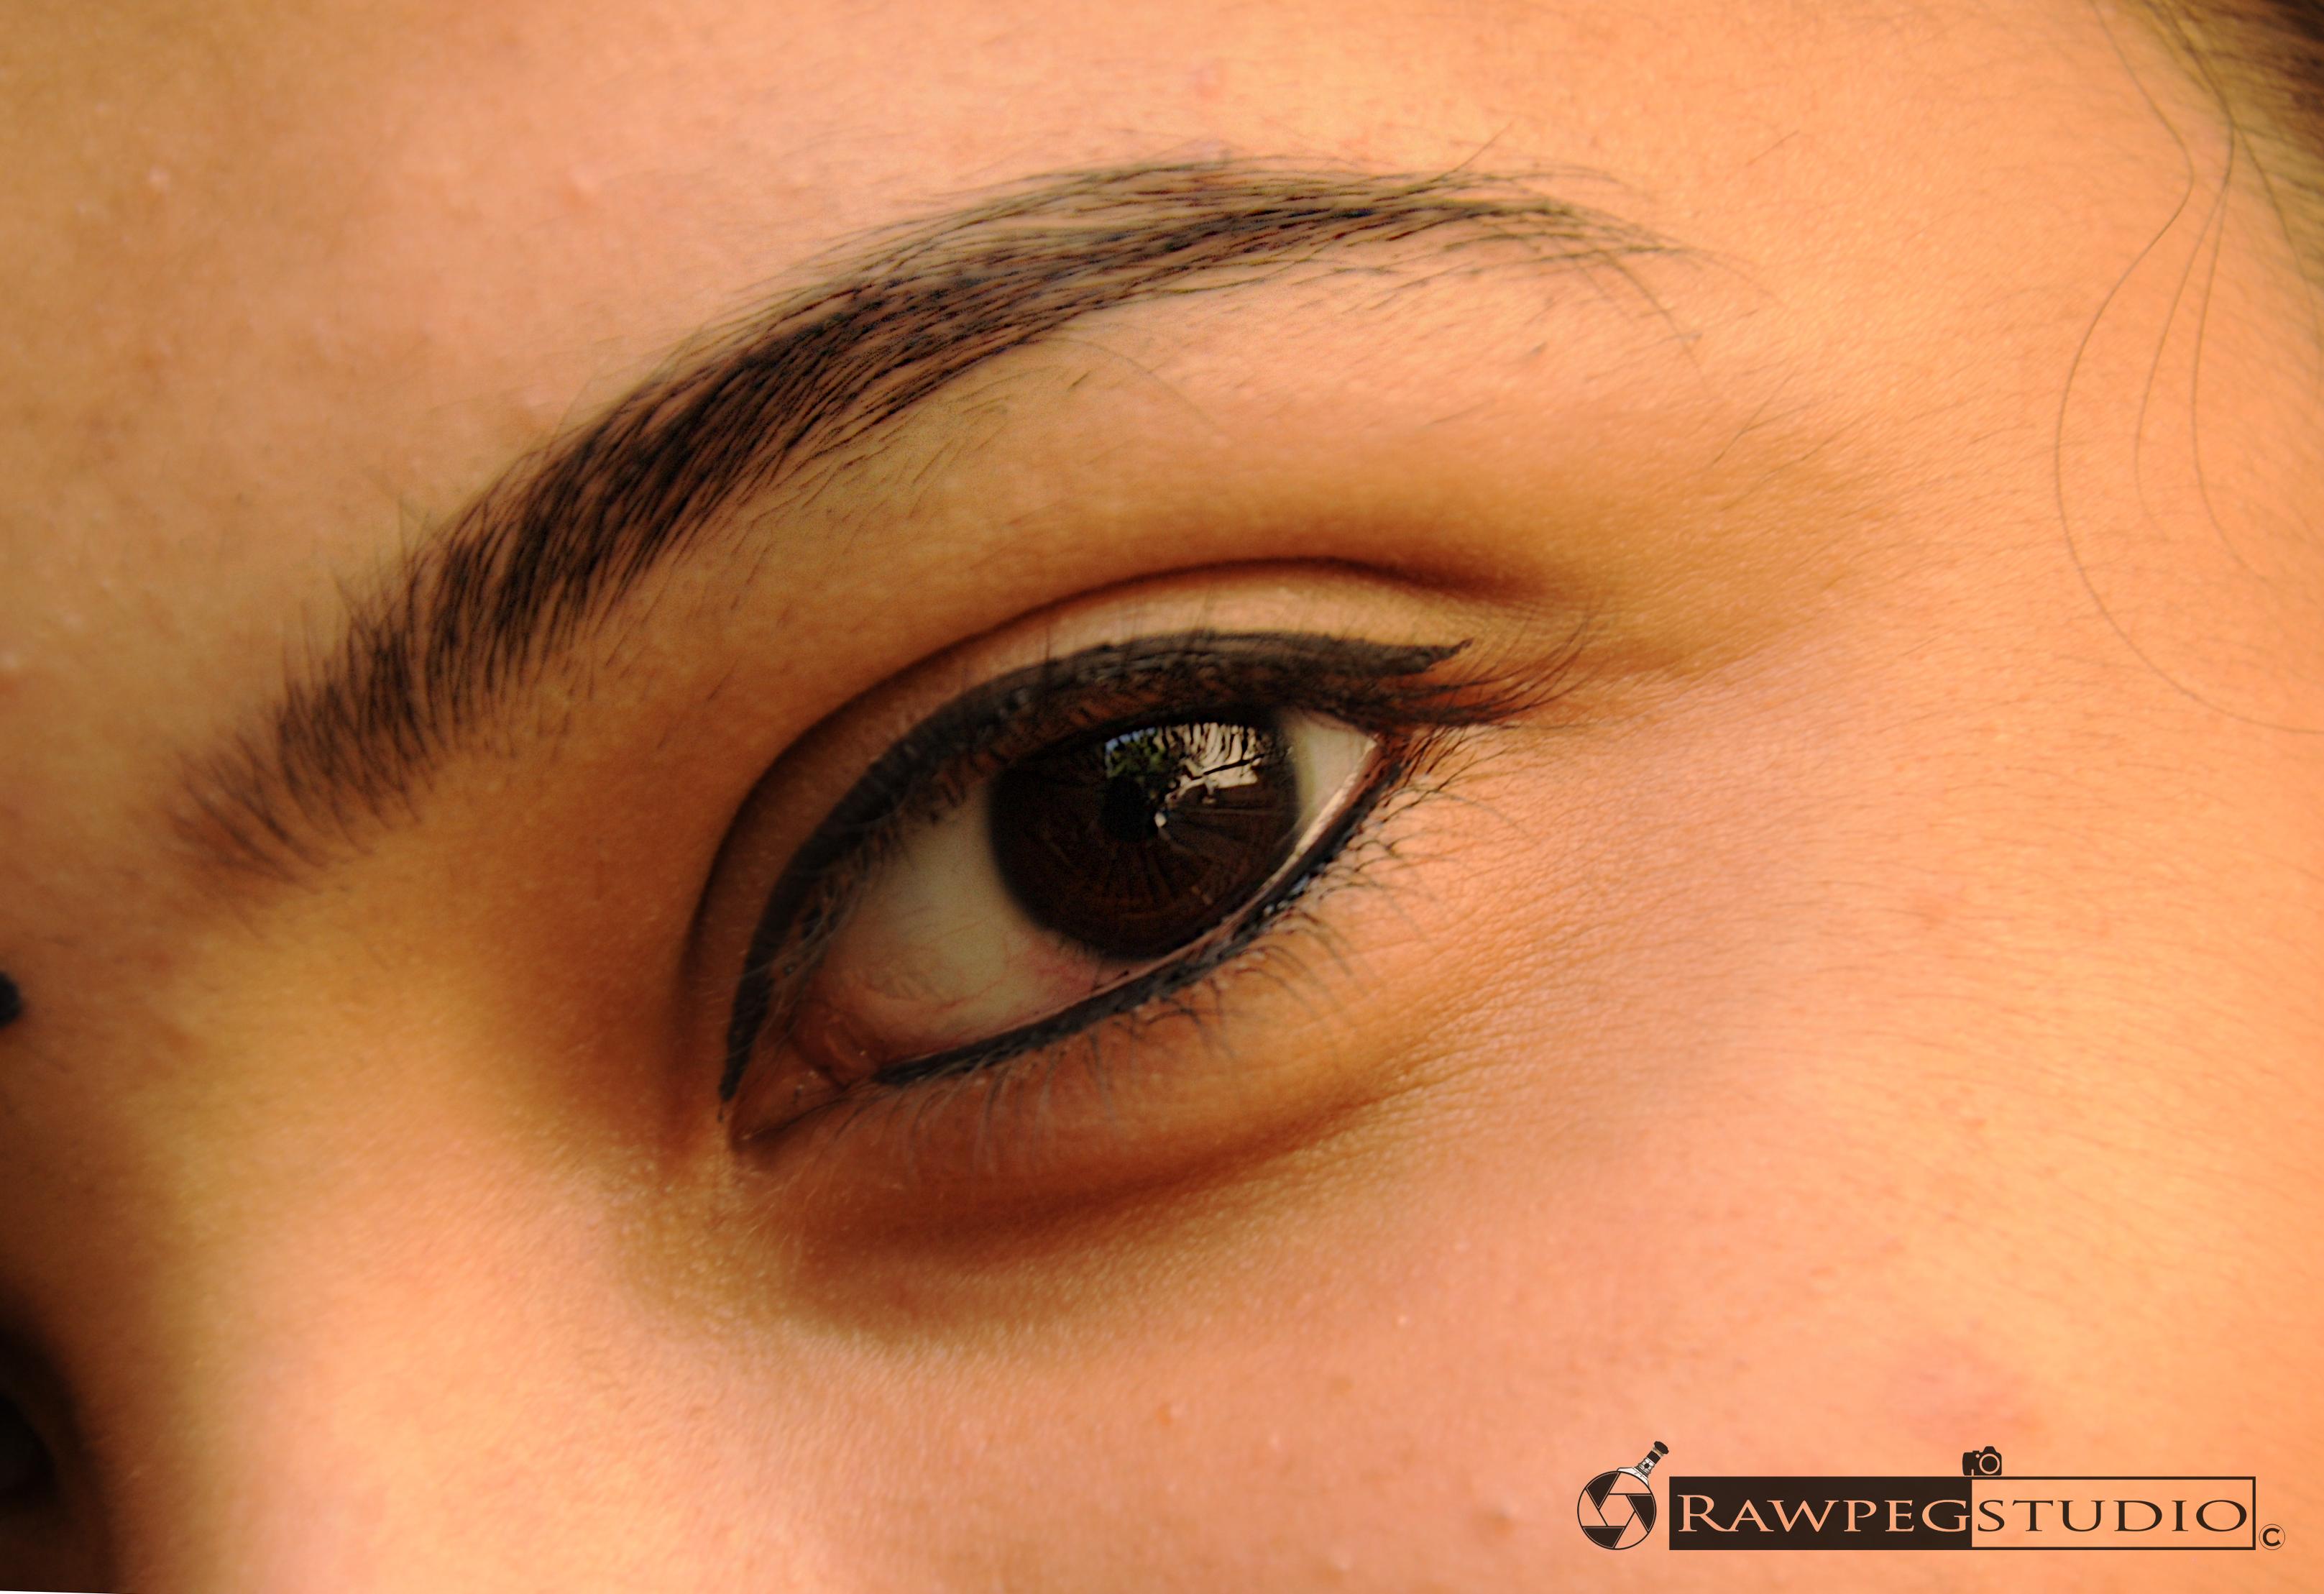 #rawpegstudio#candid#eyeshot